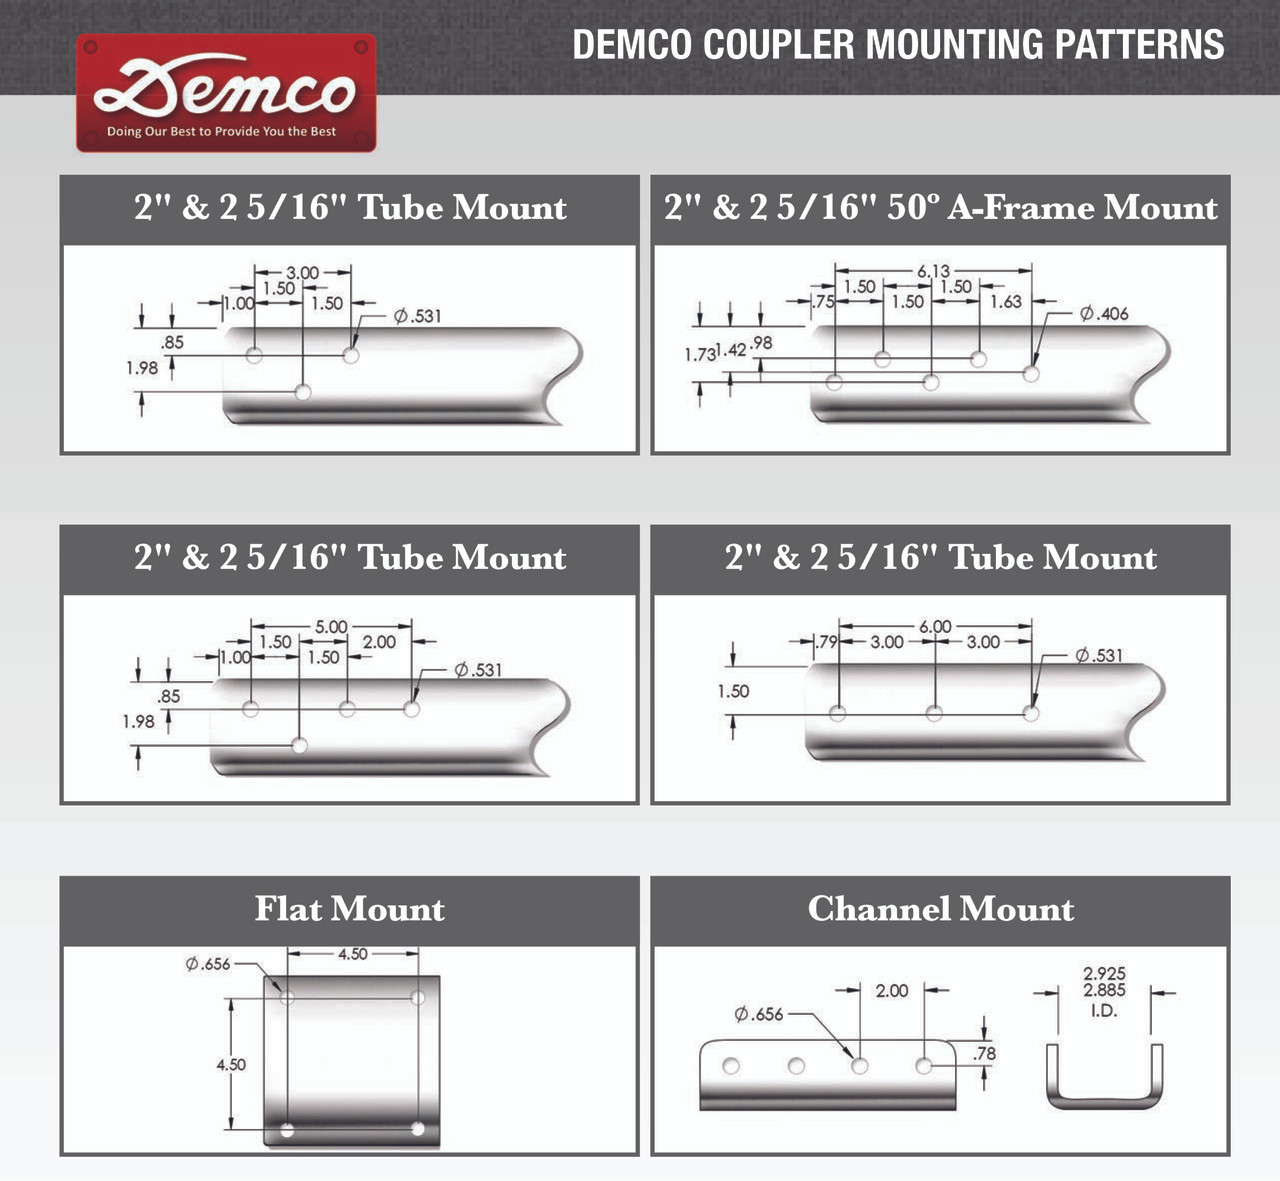 "13203-52 --- Demco eZ Latch Silver 2-5/16"" Coupler fits 3"" tongue - 18,000 lb Capacity"